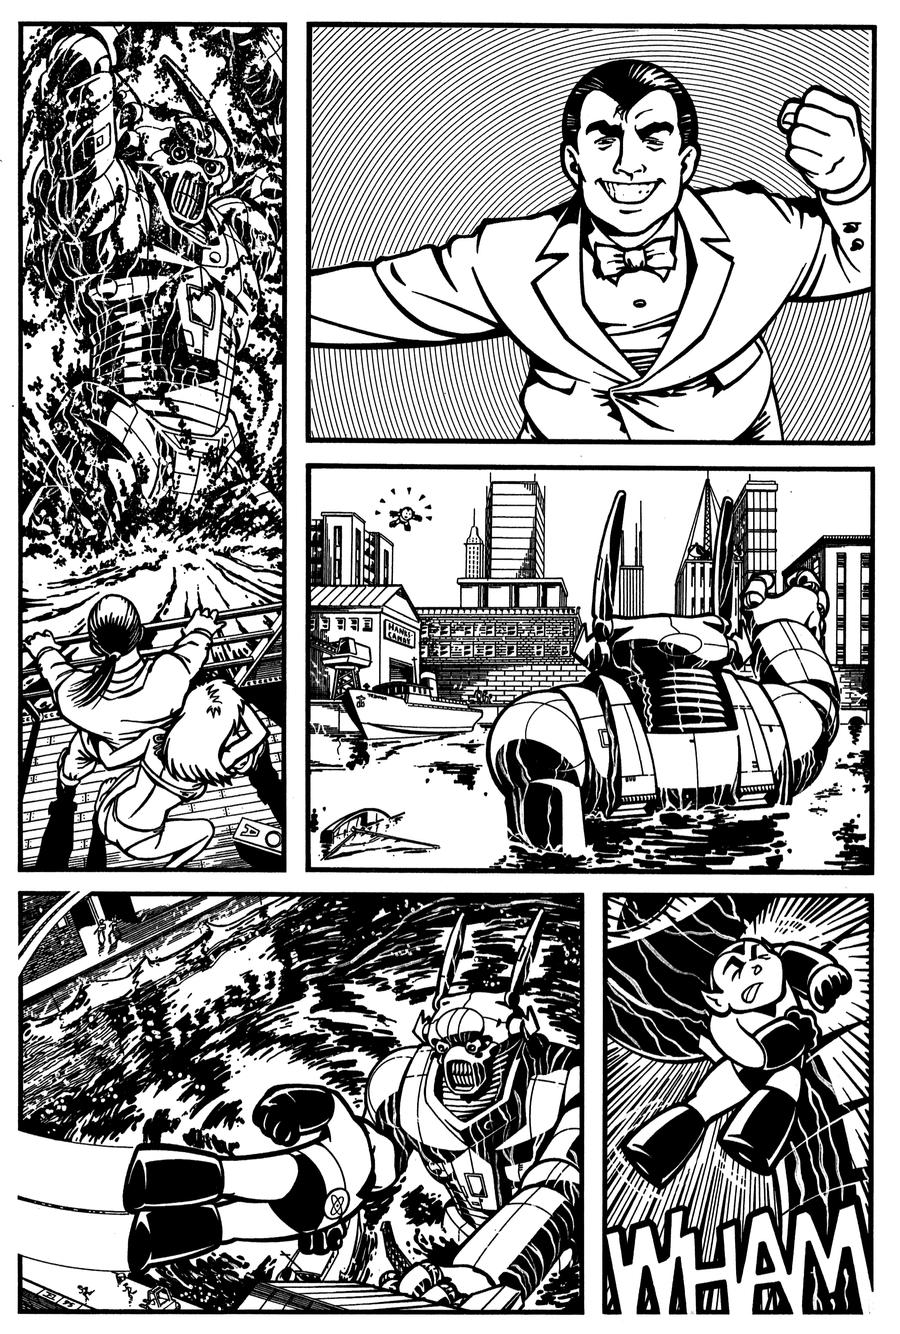 giantcity3 by DoodleLyle